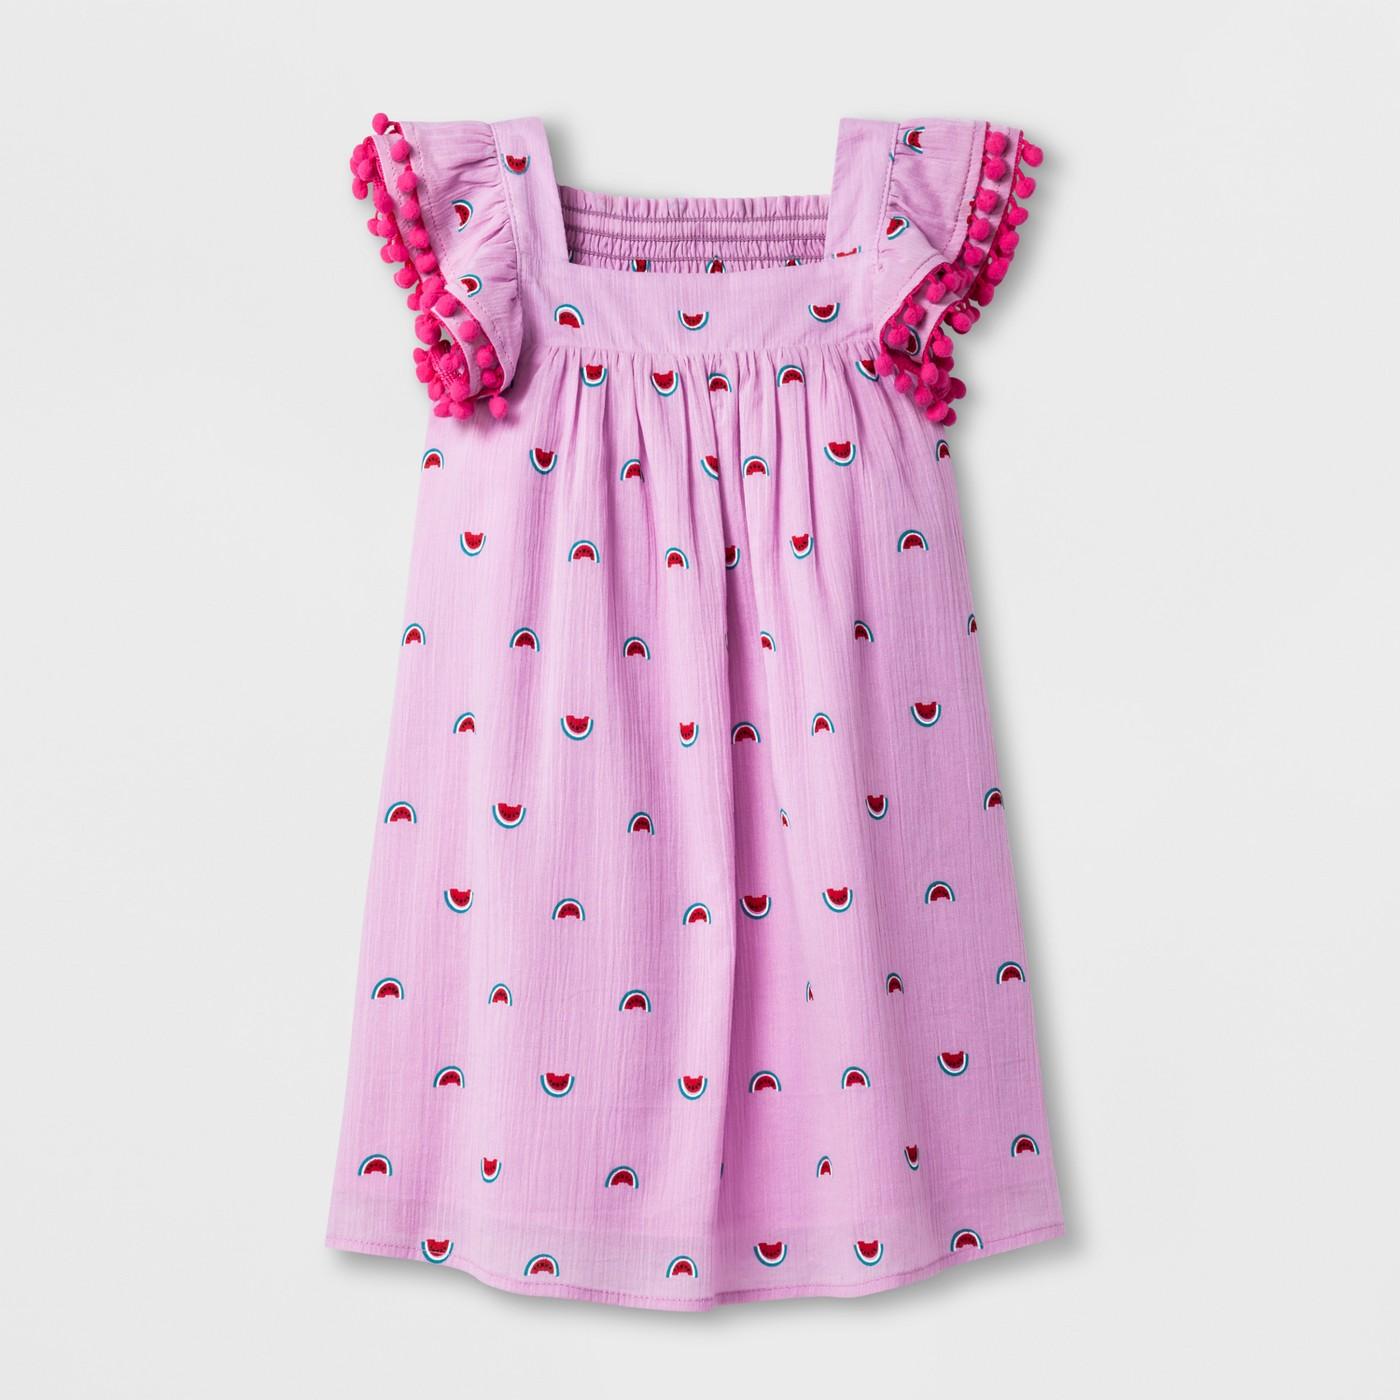 Lindsay\'s Sweet World: Five on Friday - Watermelon Dress, Books ...